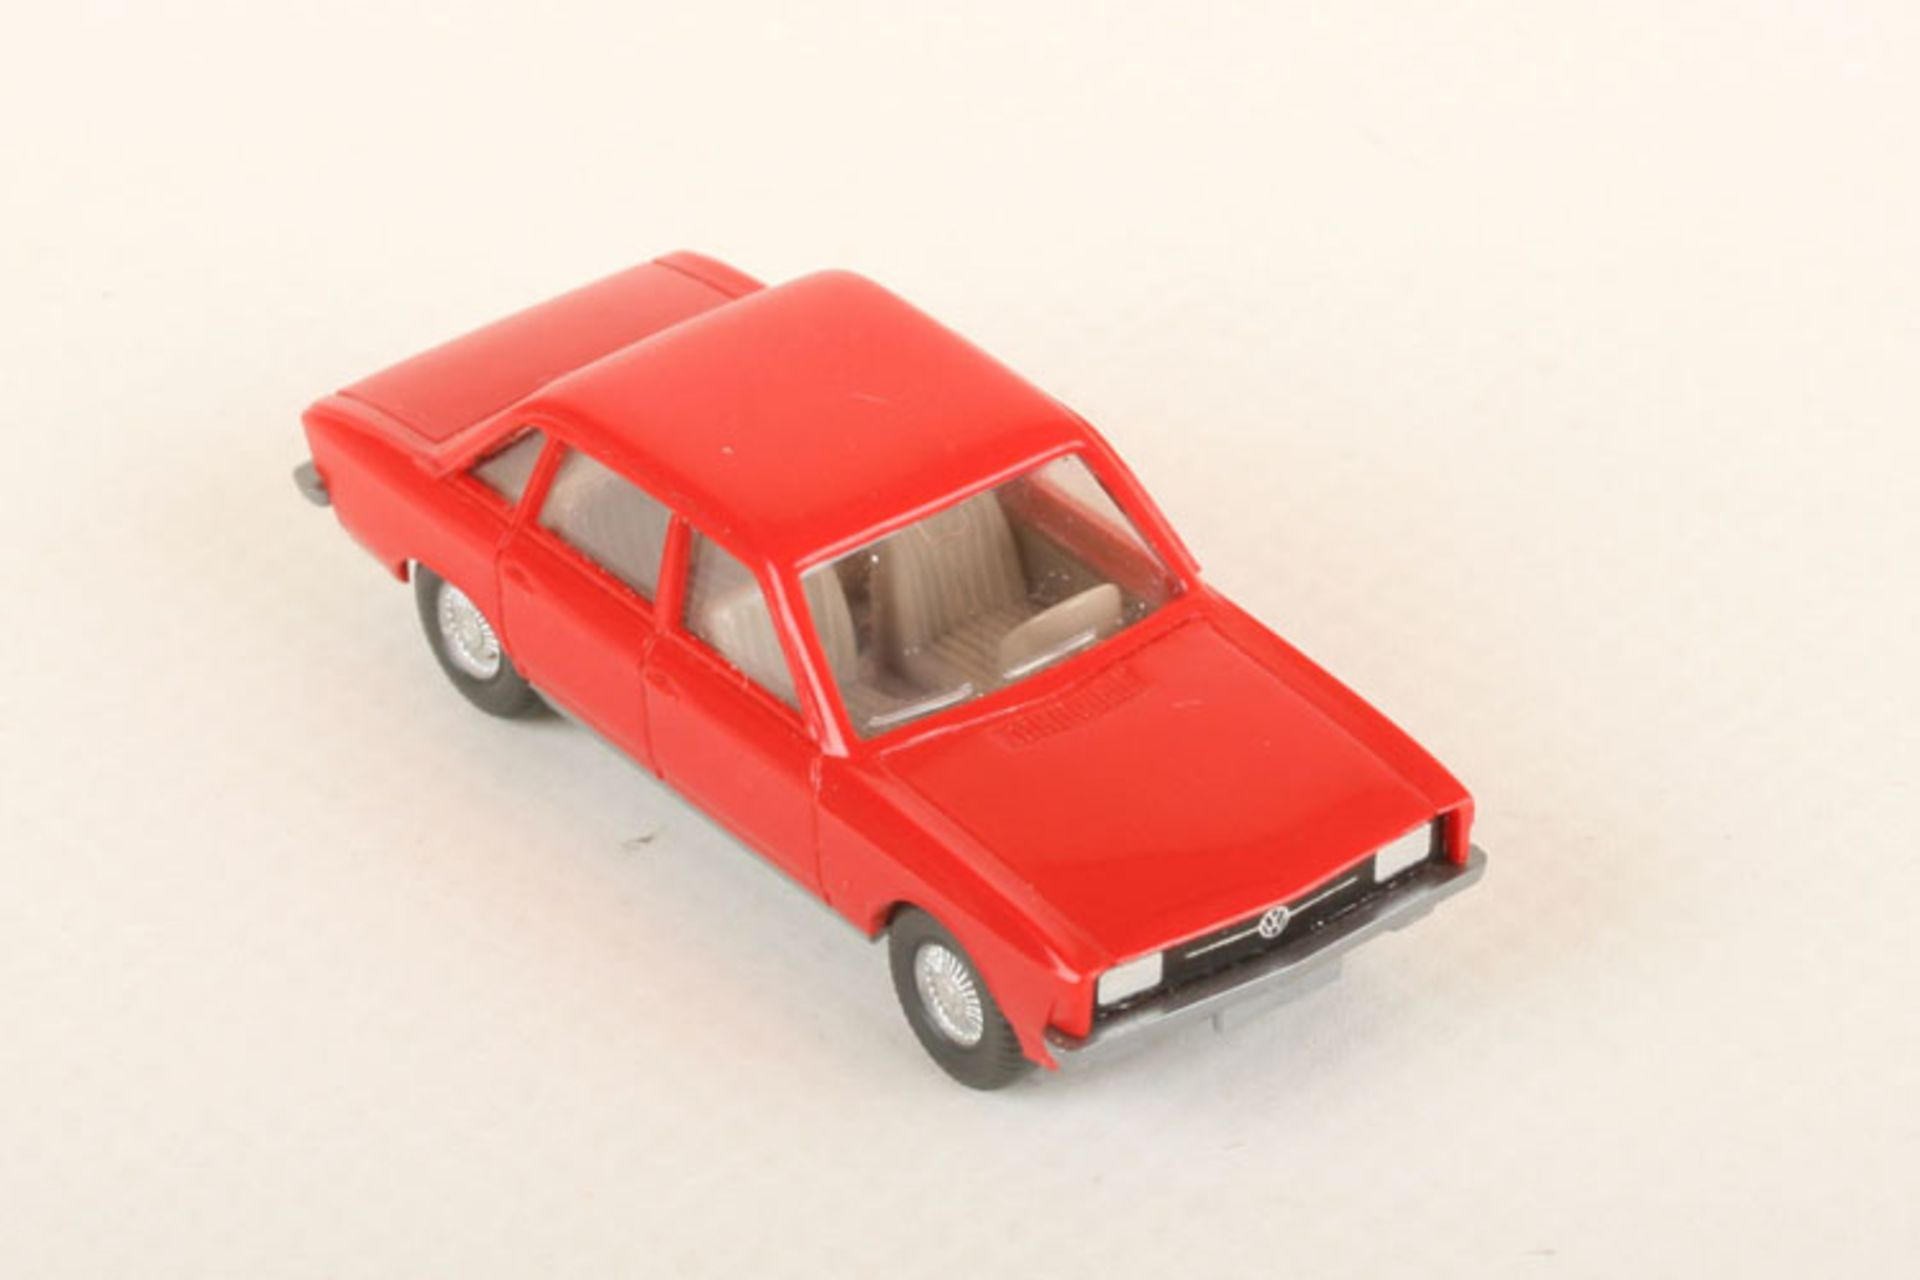 Los 1044 - Wiking VW K 70 rot 47/2c, neuwertig